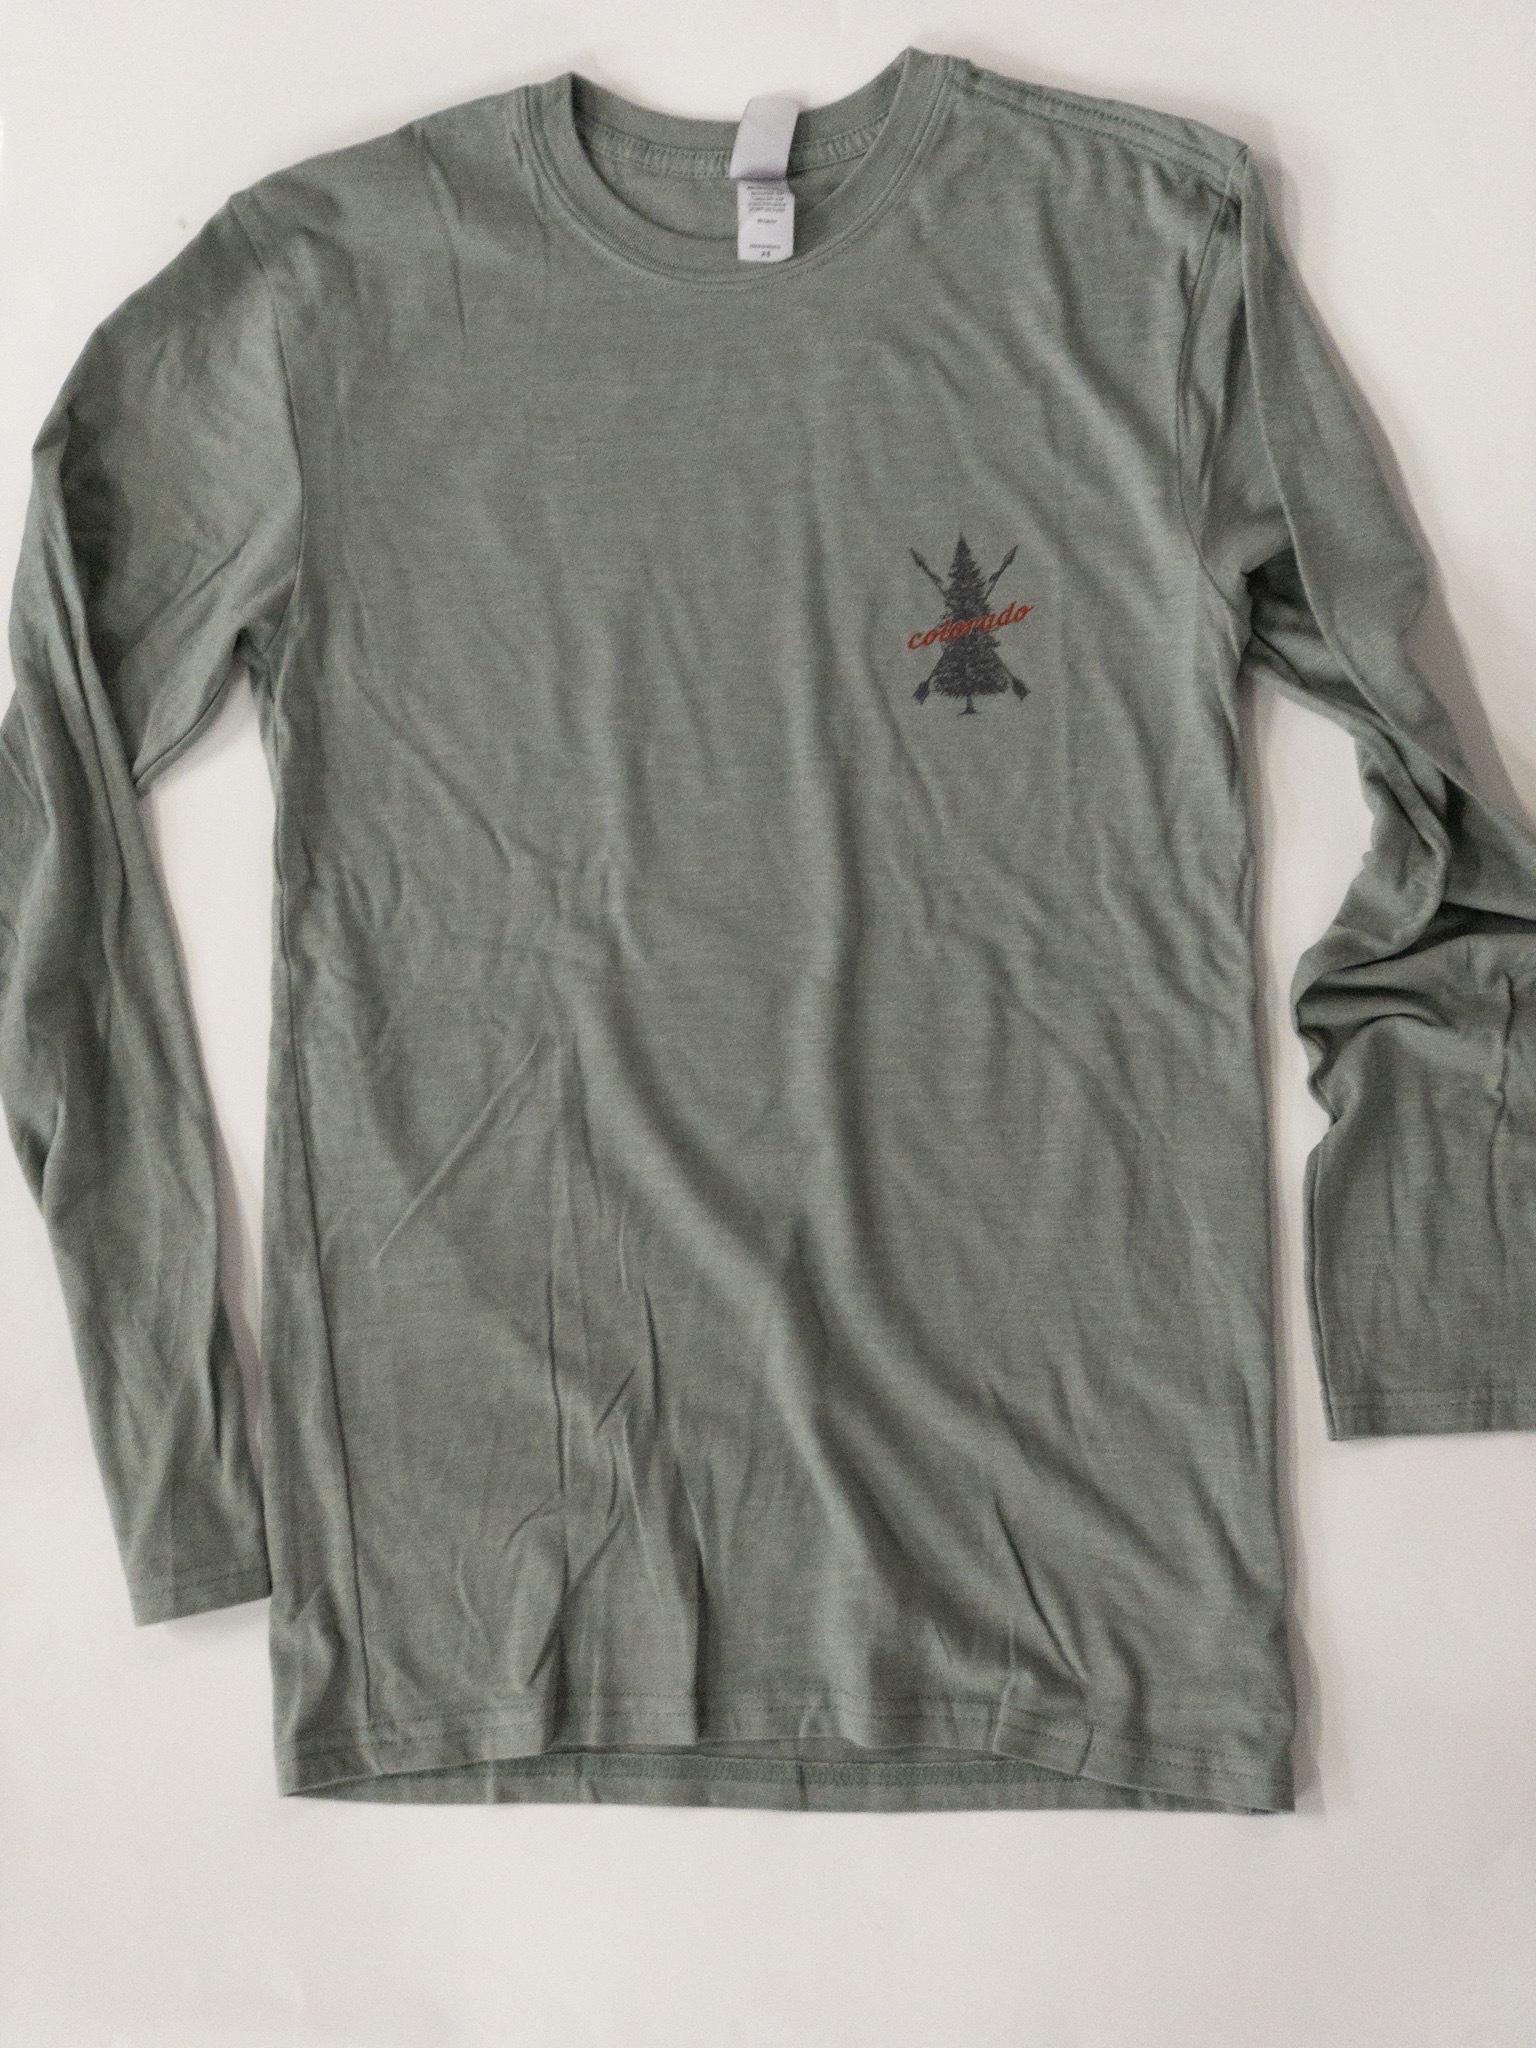 Grey Green Colorado Tree T-shirt 00023